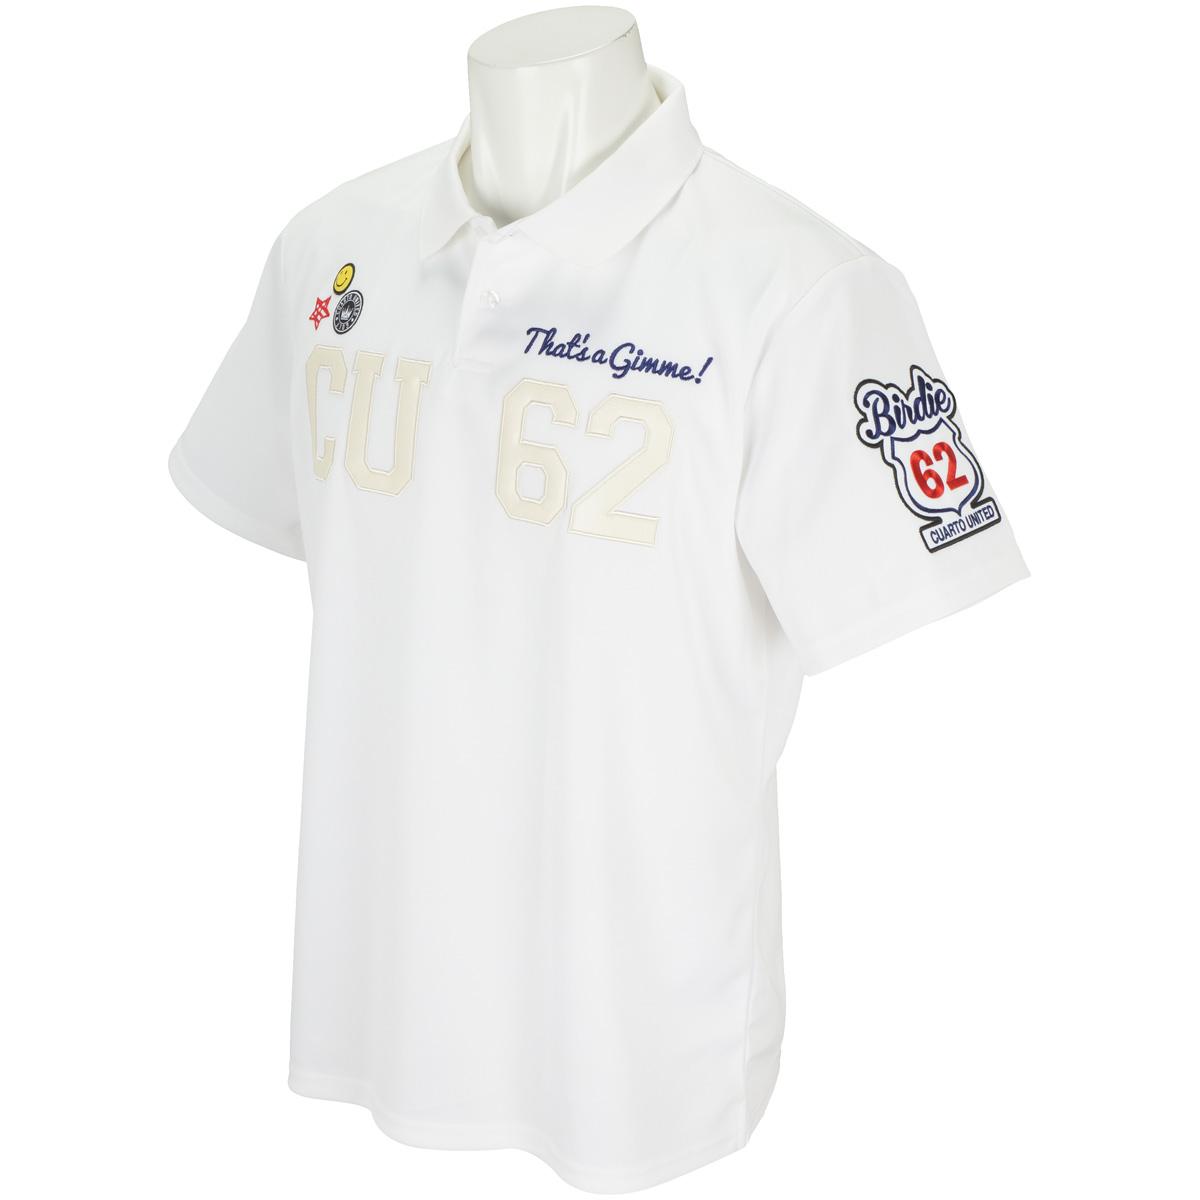 CU62刺繍半袖ポロシャツ